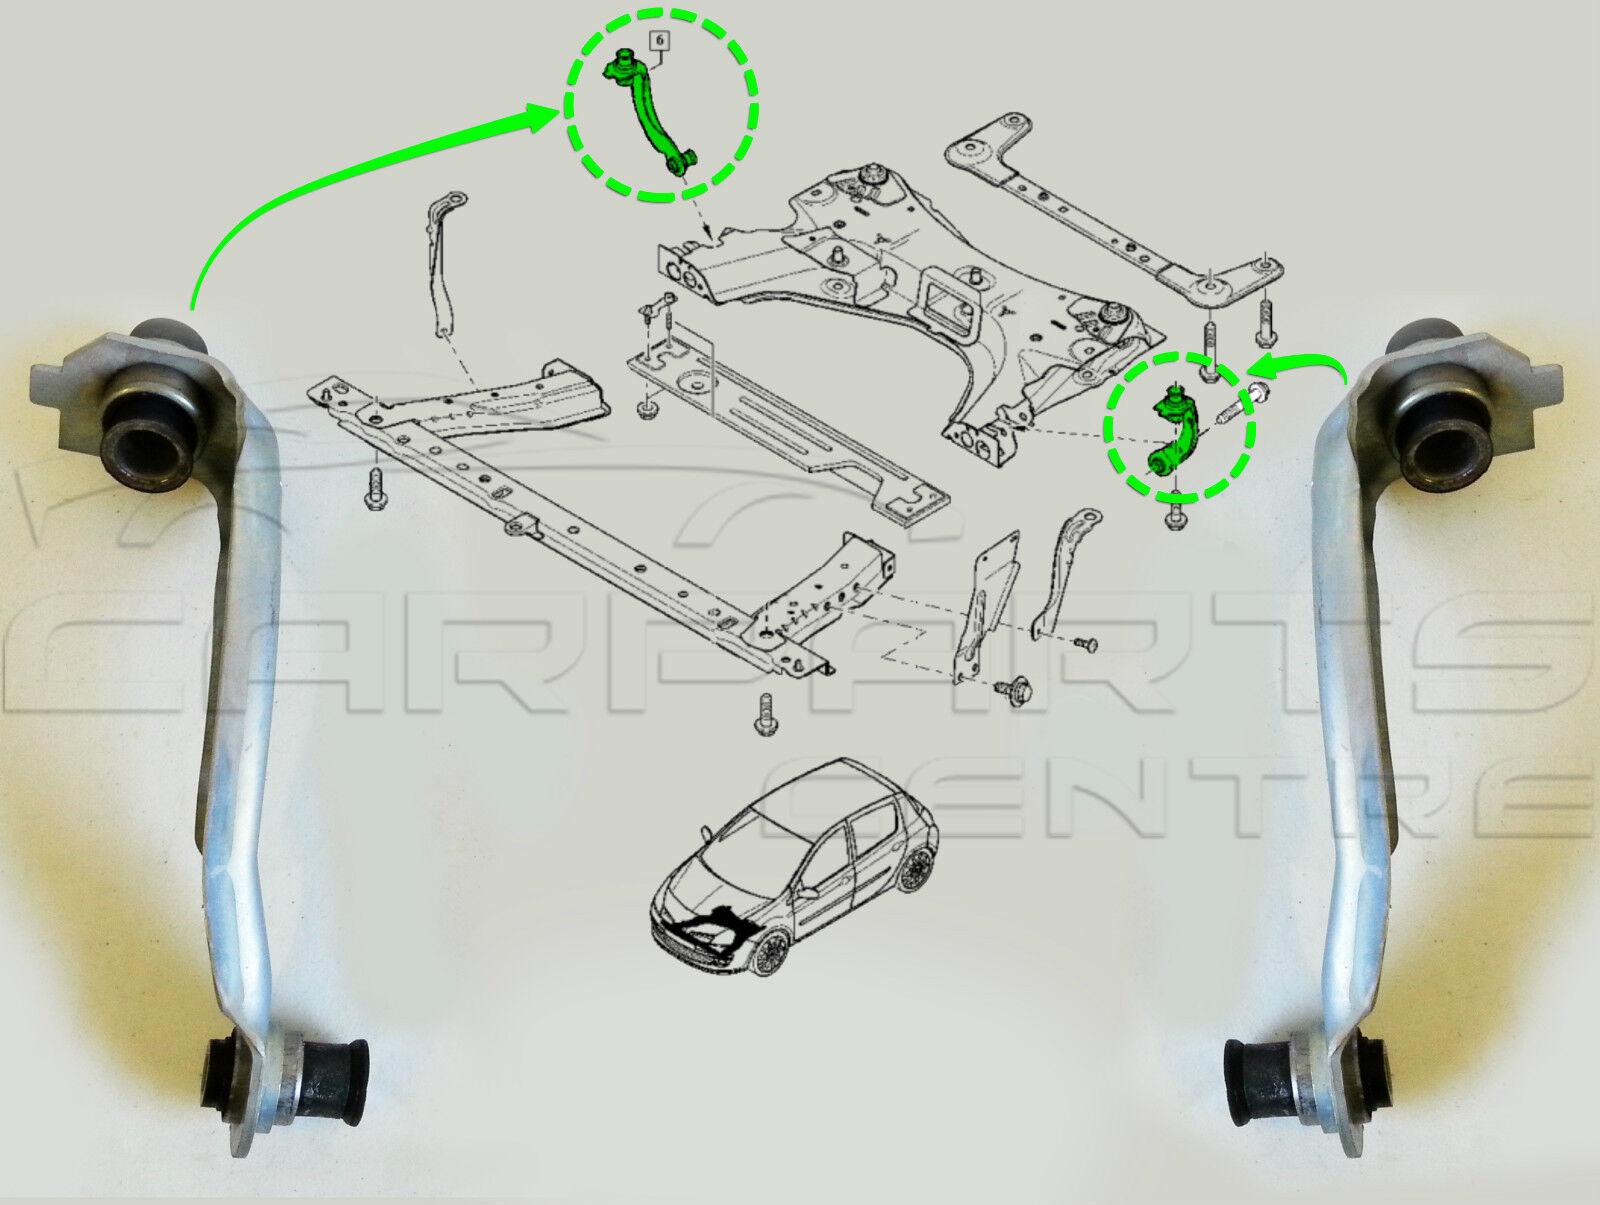 For Renault Clio Mk3 2005 Front Subframe Mount Mounting Control Arm Fuel Pump Diagram Bush Bushes